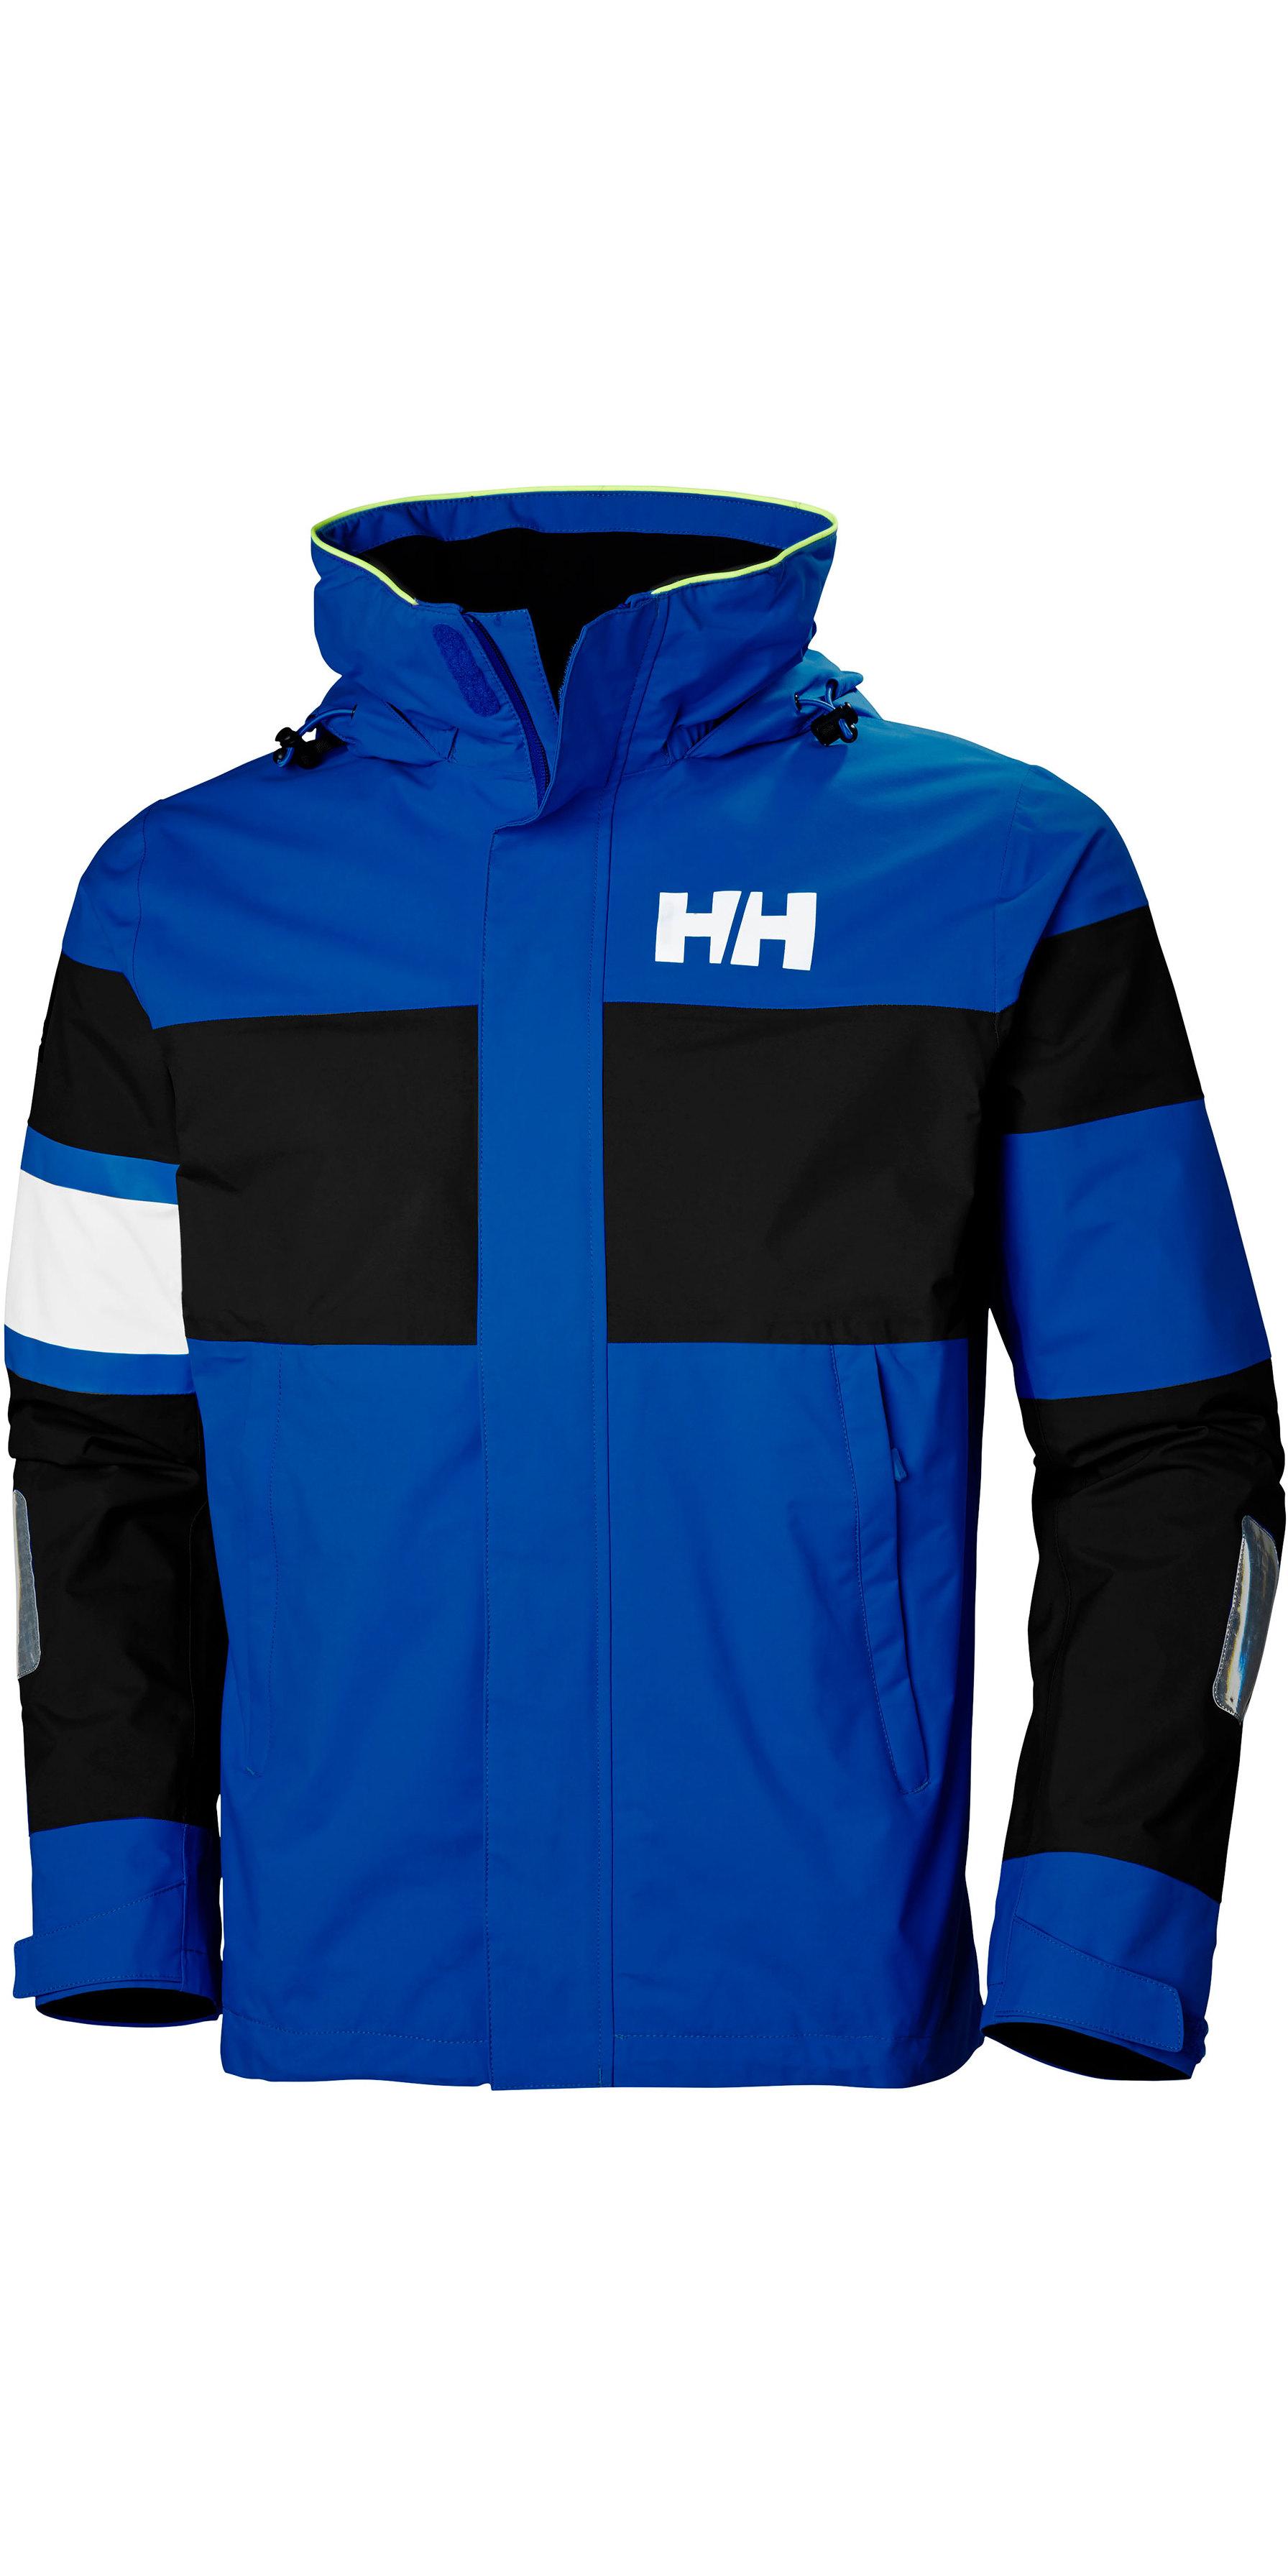 2019 Helly Hansen Salt Lettjakke Navy 33911 Seiling